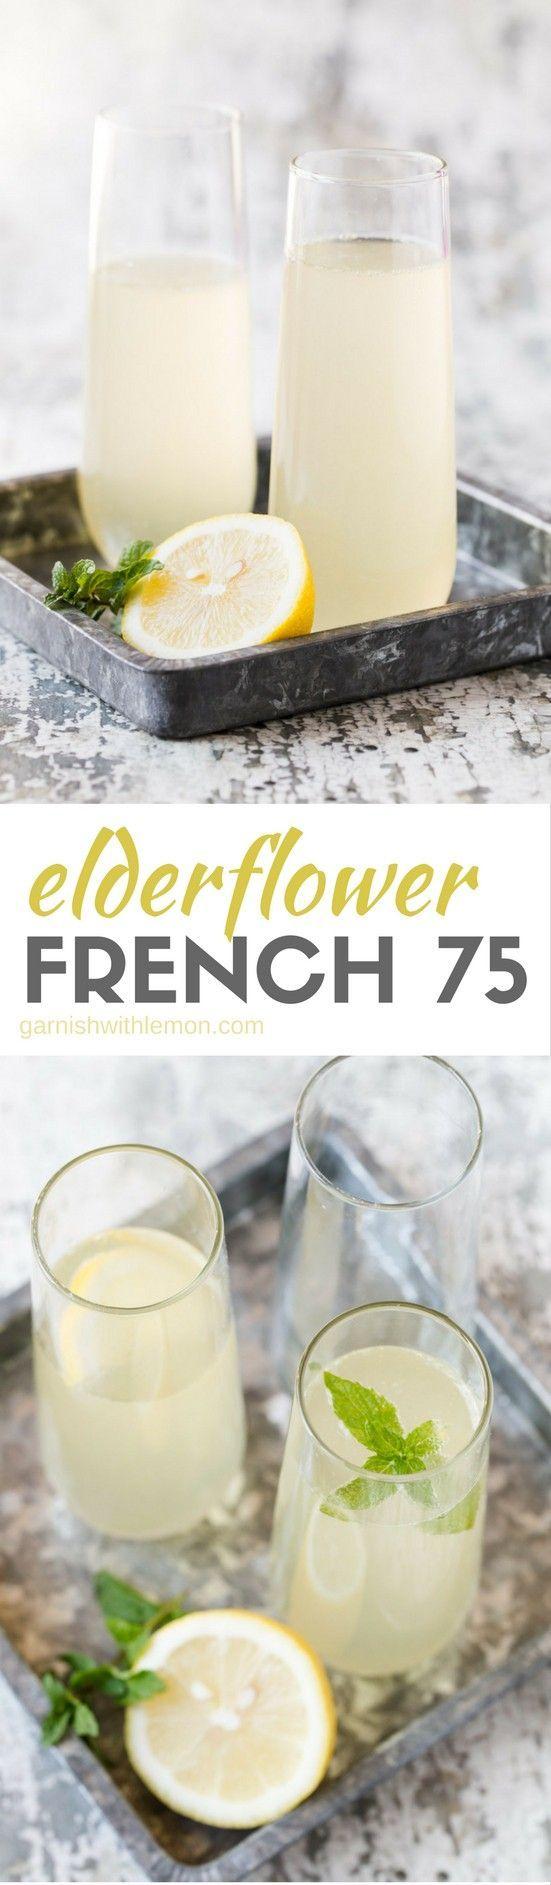 Bubbles just got even better with this easy Elderflower French 75 cocktail recipe. #elderflower #brunch #prosecco #proseccococktails #cocktails